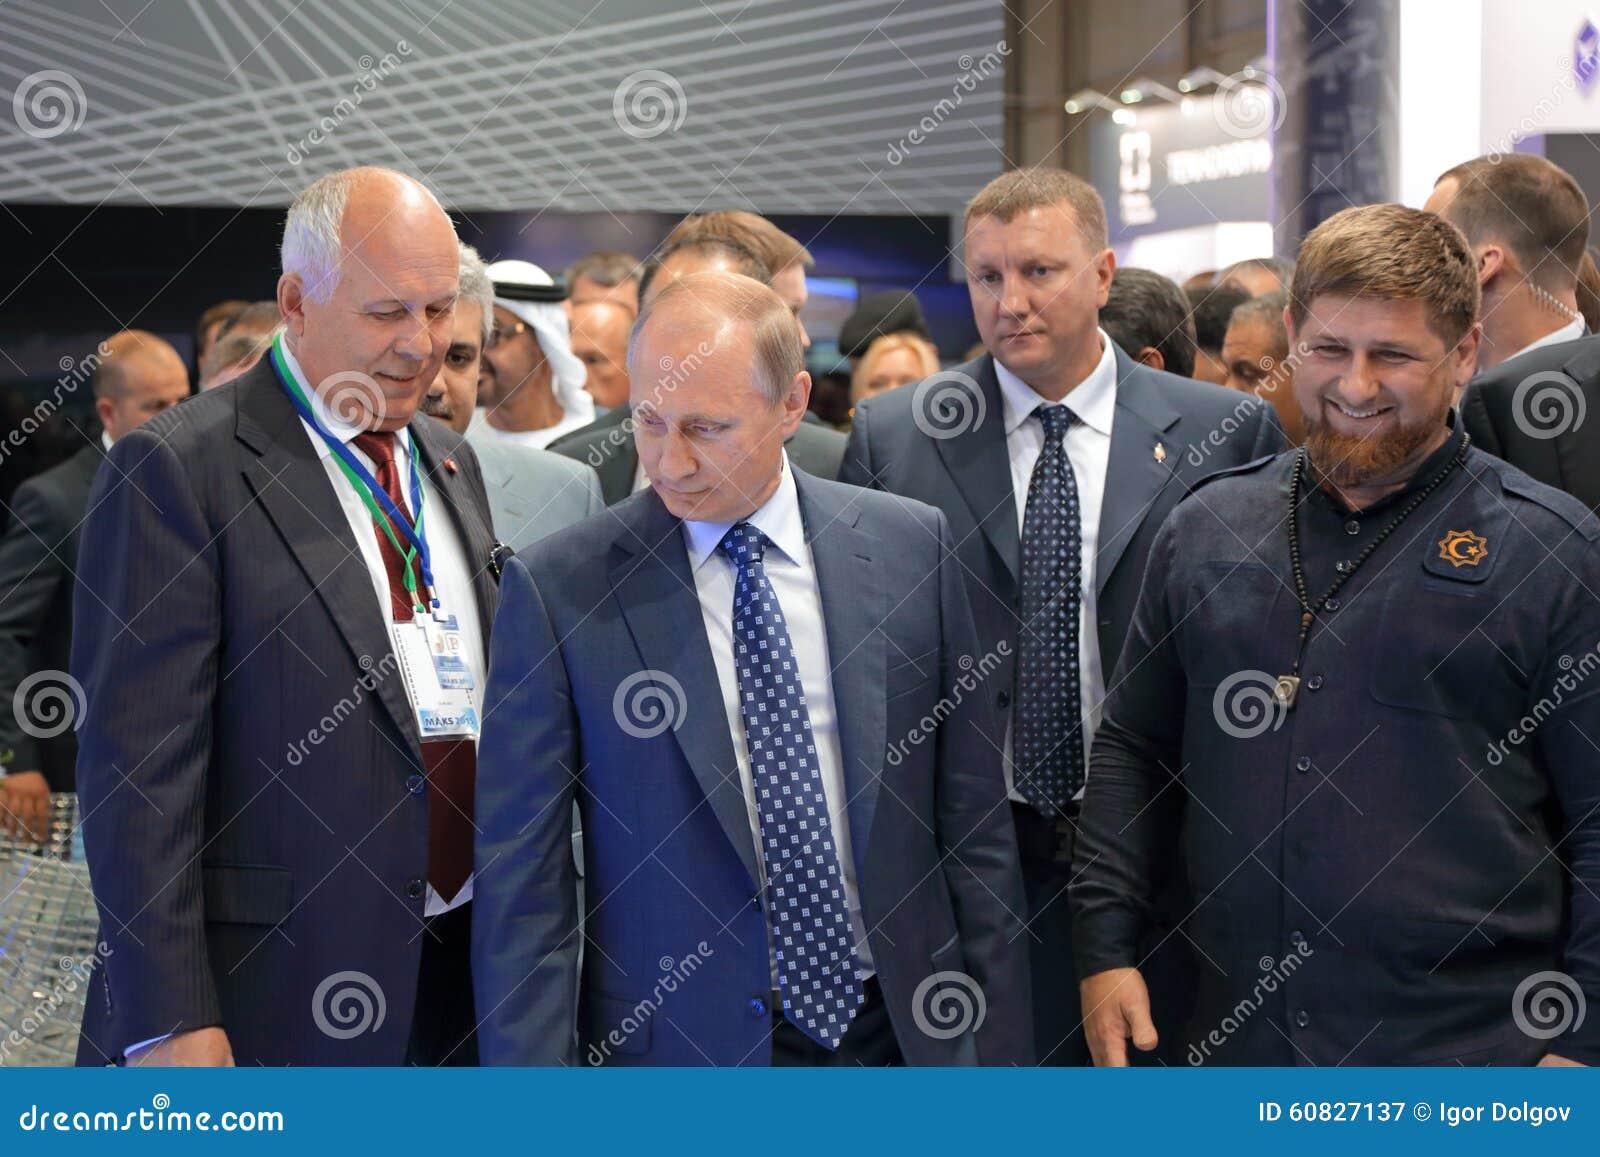 Vladimir Zhukovsky shared a photo 70